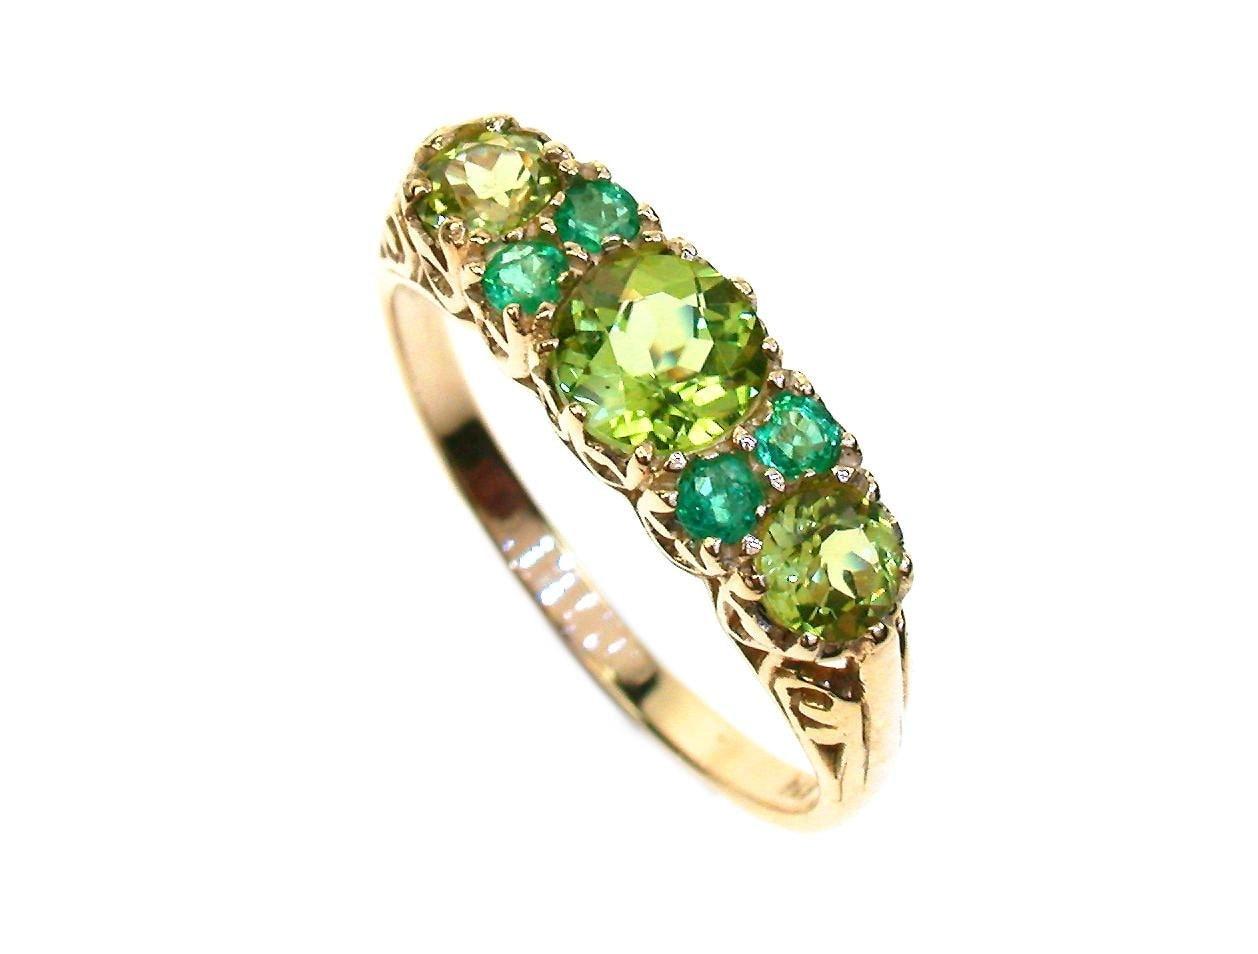 vintage peridot ring 9ct 9k gold peridot emerald ring